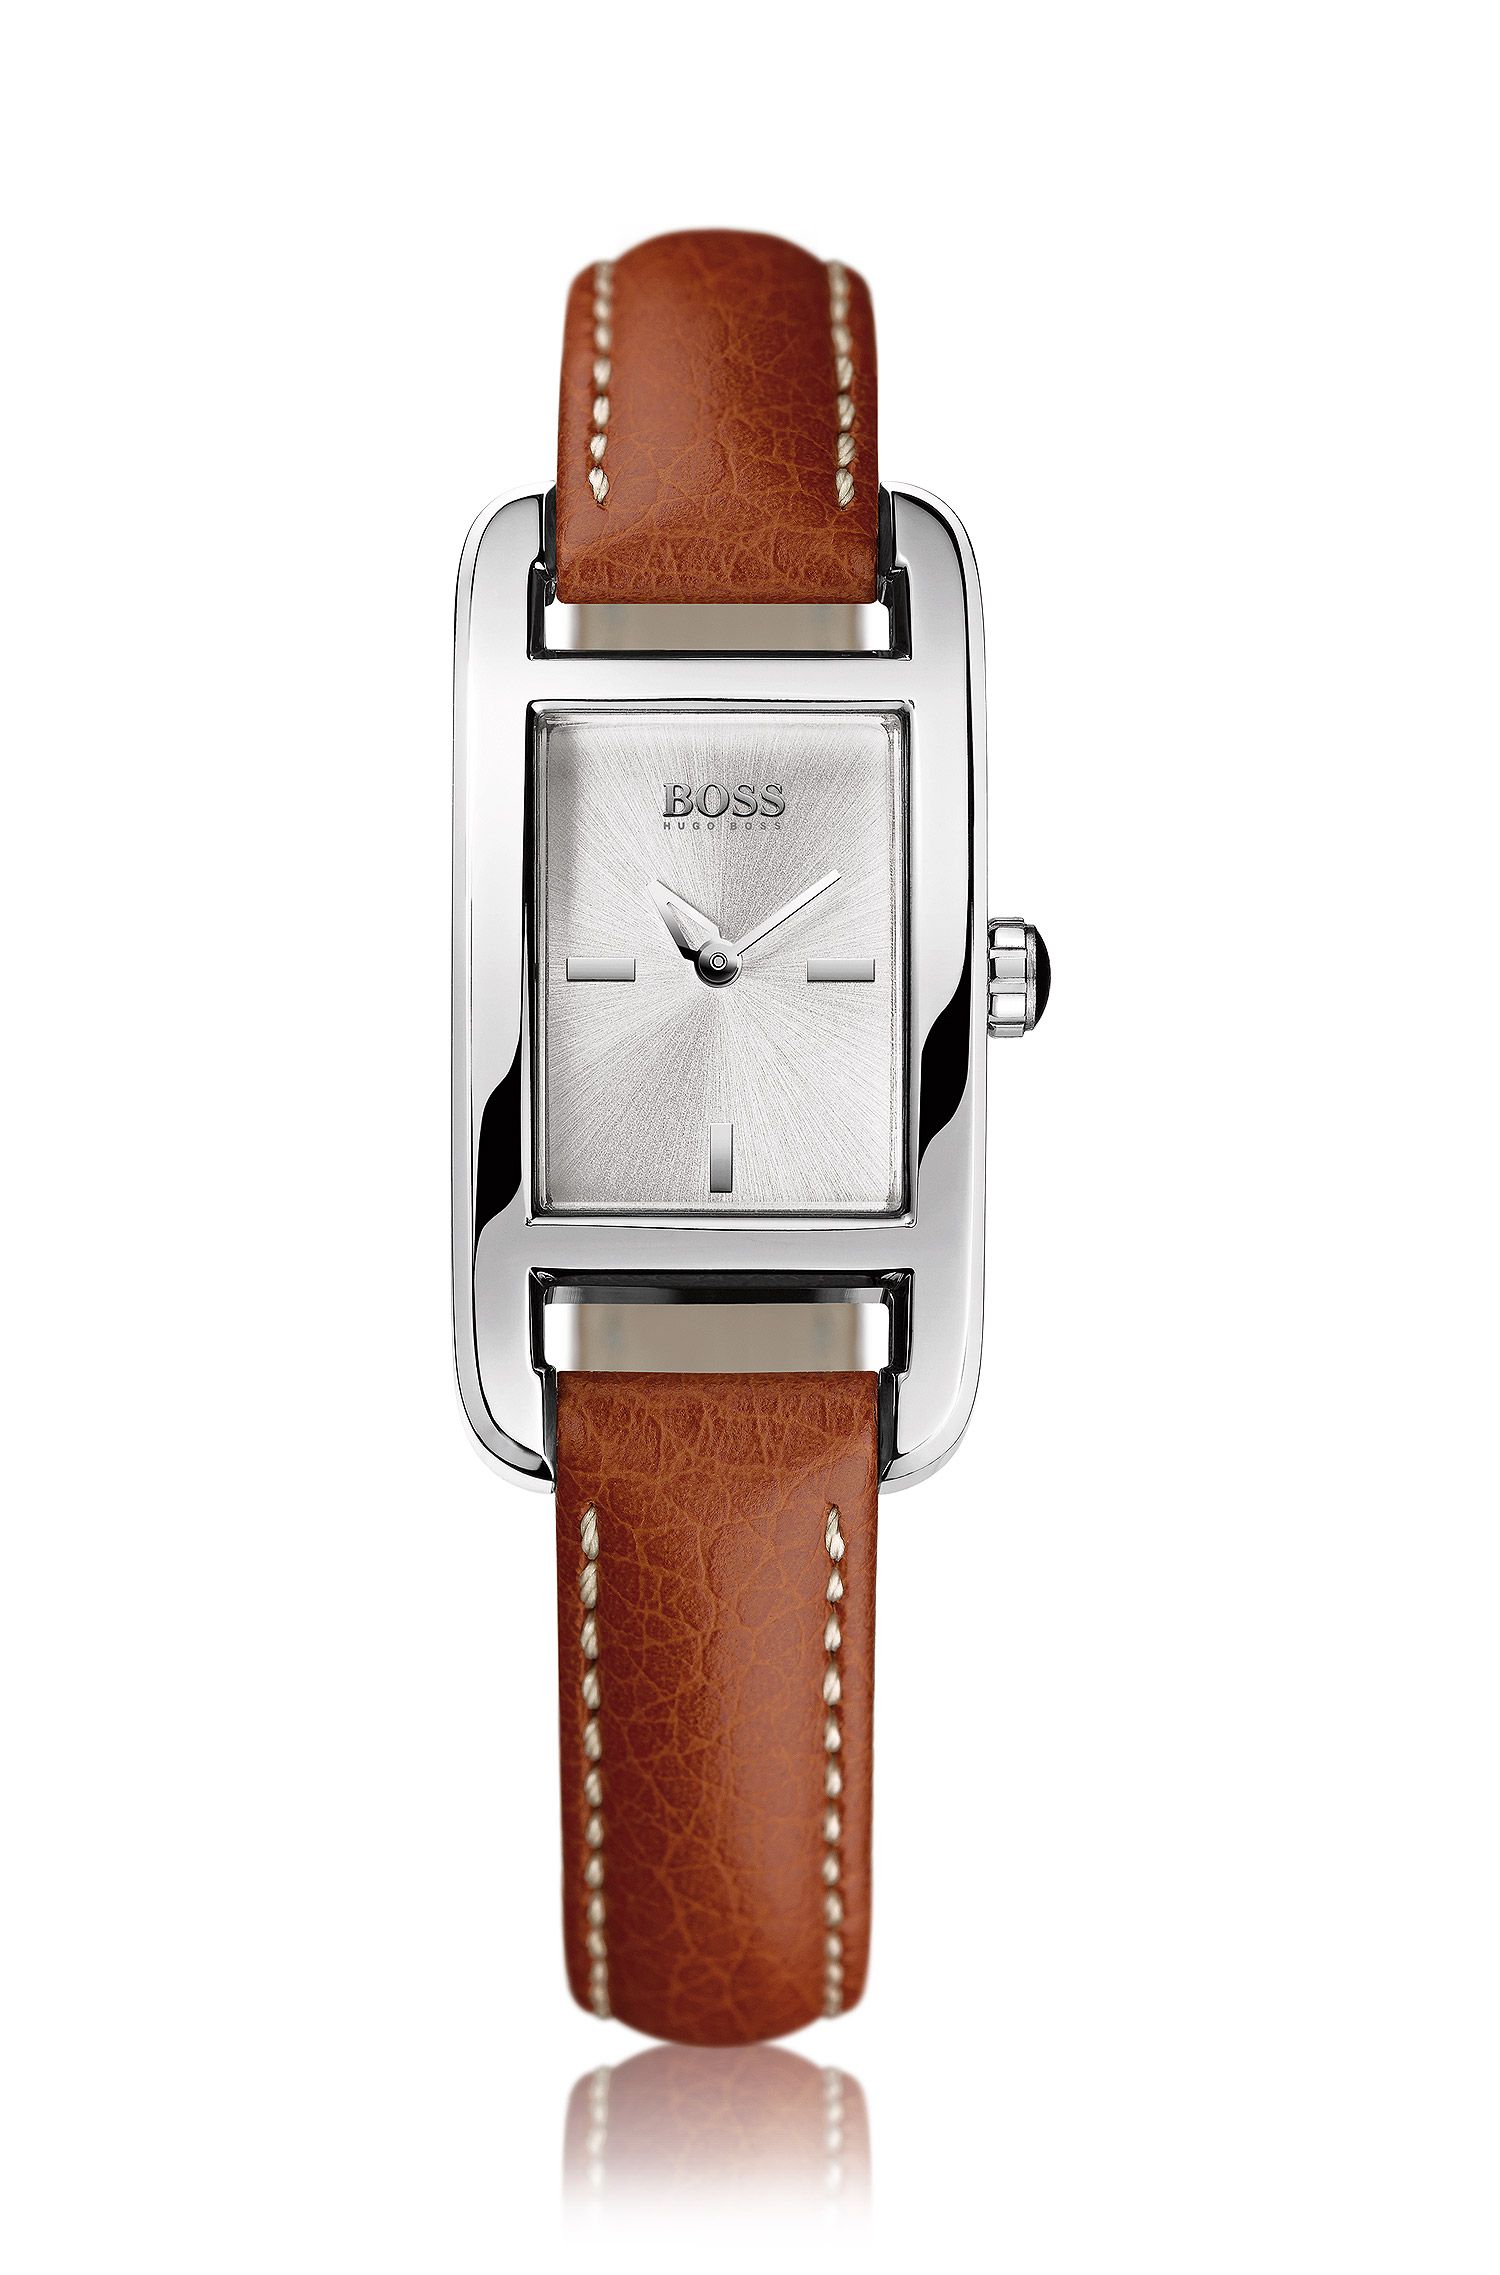 Damen-Armbanduhr ´HB304` mit Edelstahlgehäuse